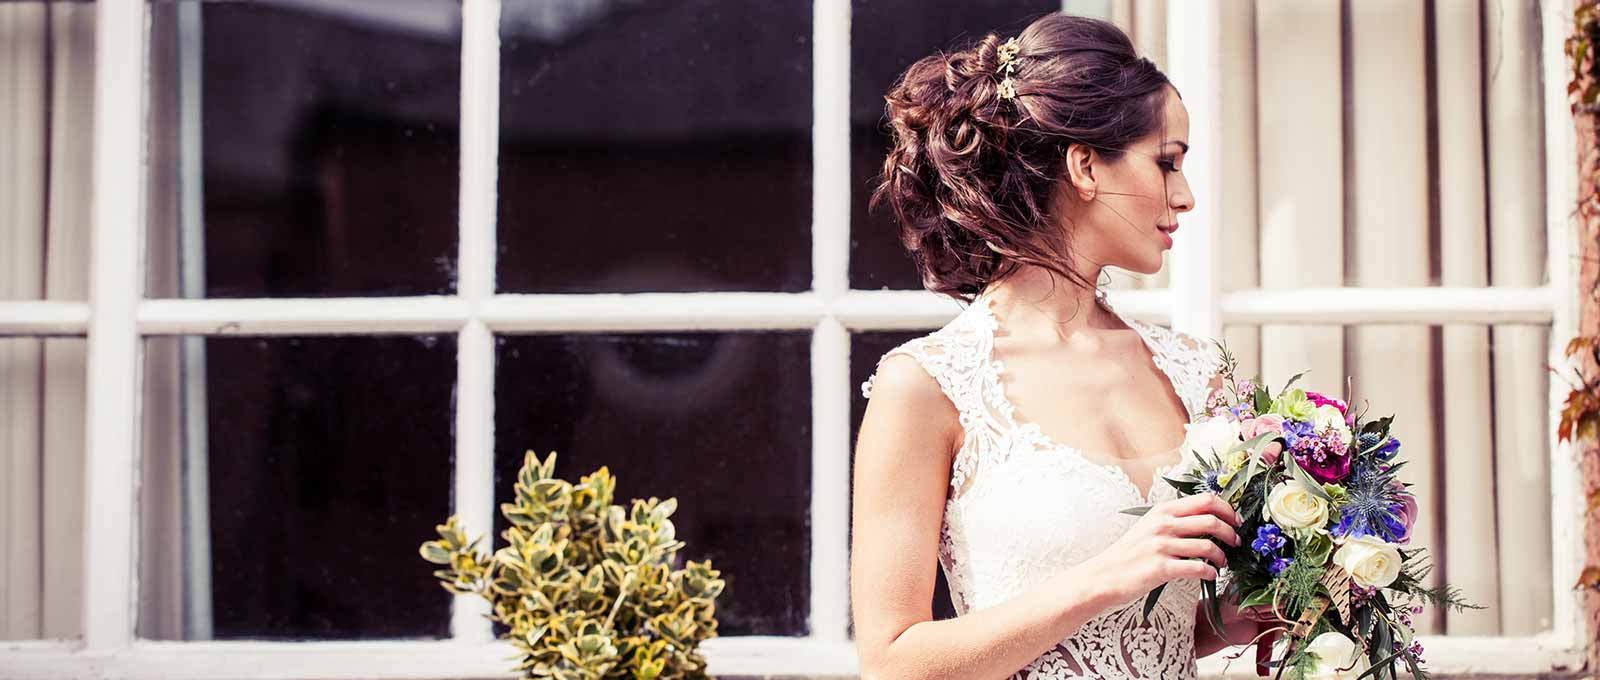 bridal shop york, FAQ's, Wedding Dresses York from The Bridal Affair